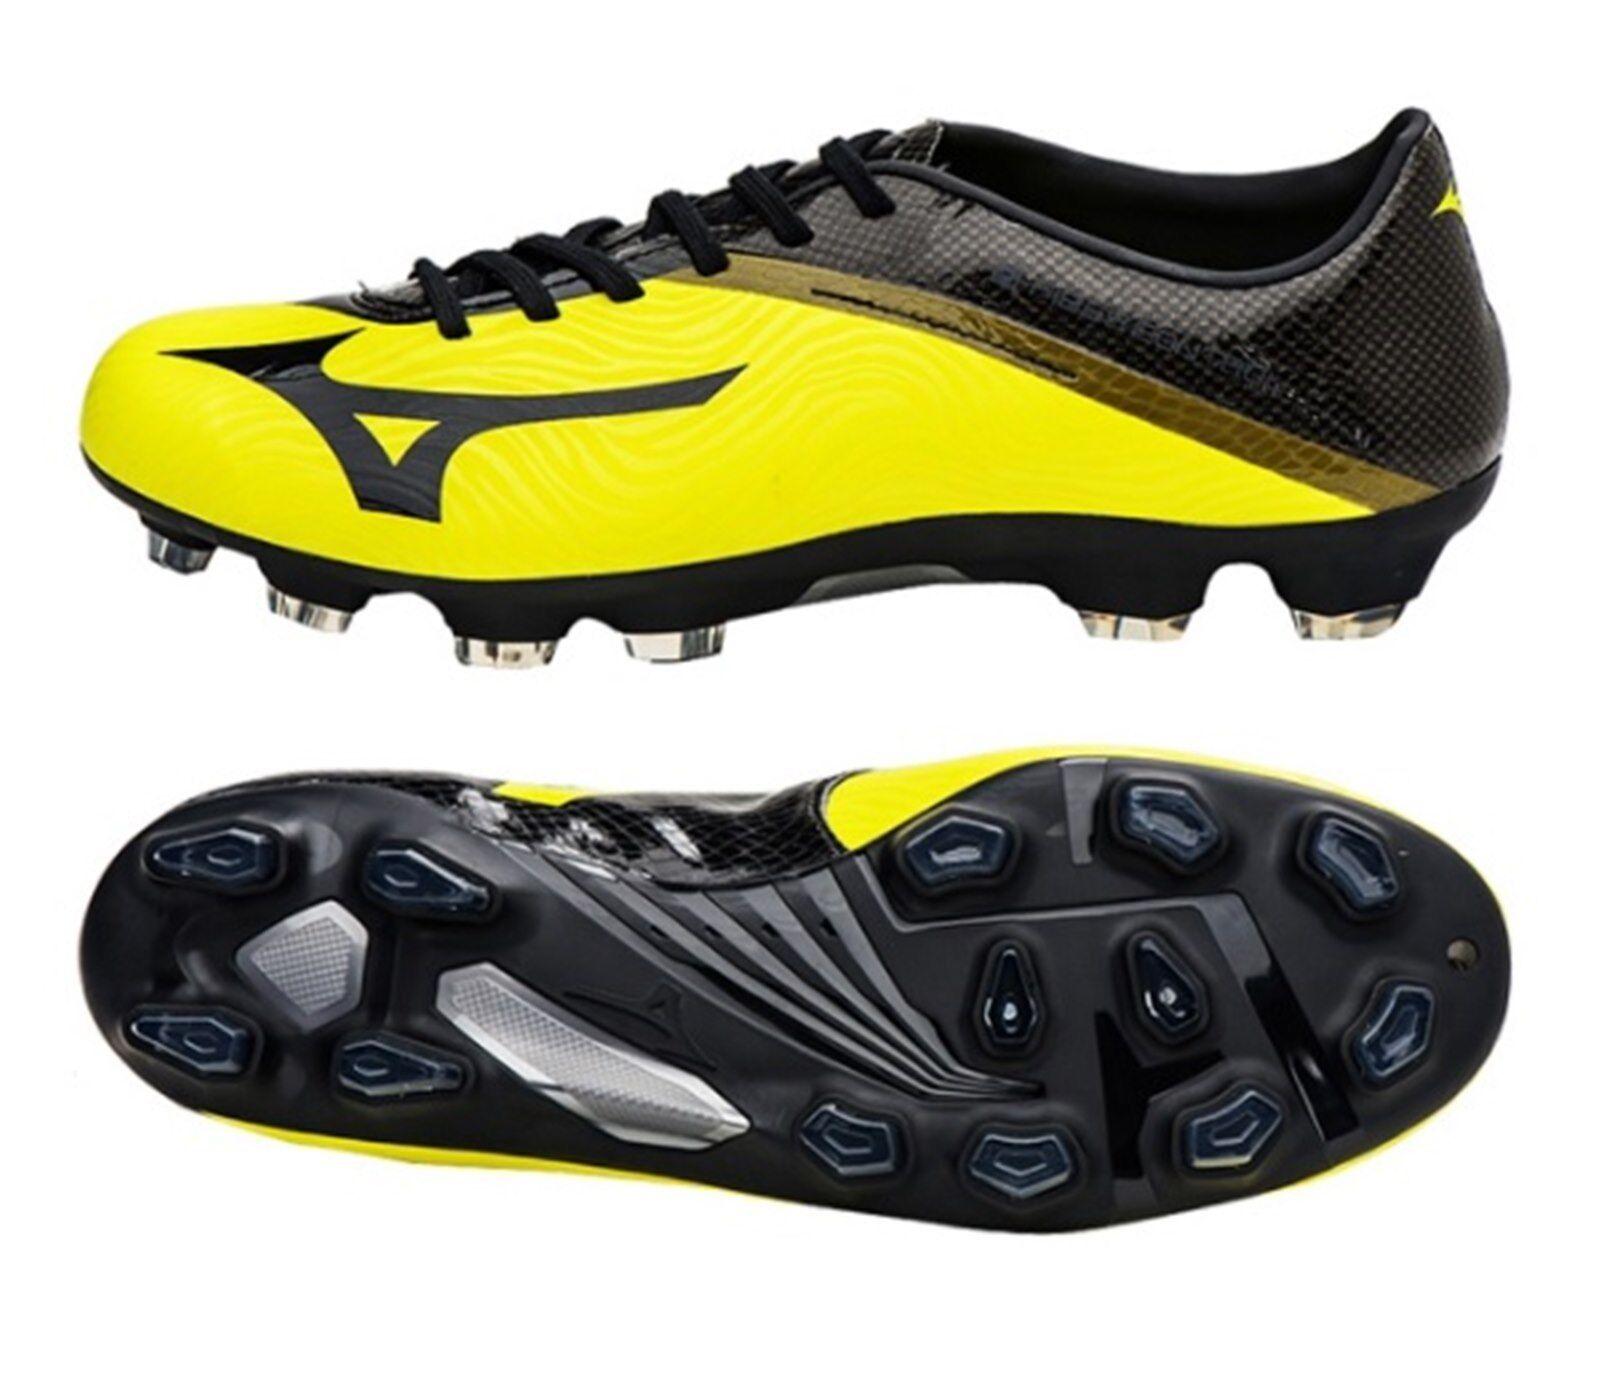 Mizuno Men BASARA 101 MD Cleats Soccer Football Gelb schuhe Spike P1GA166209